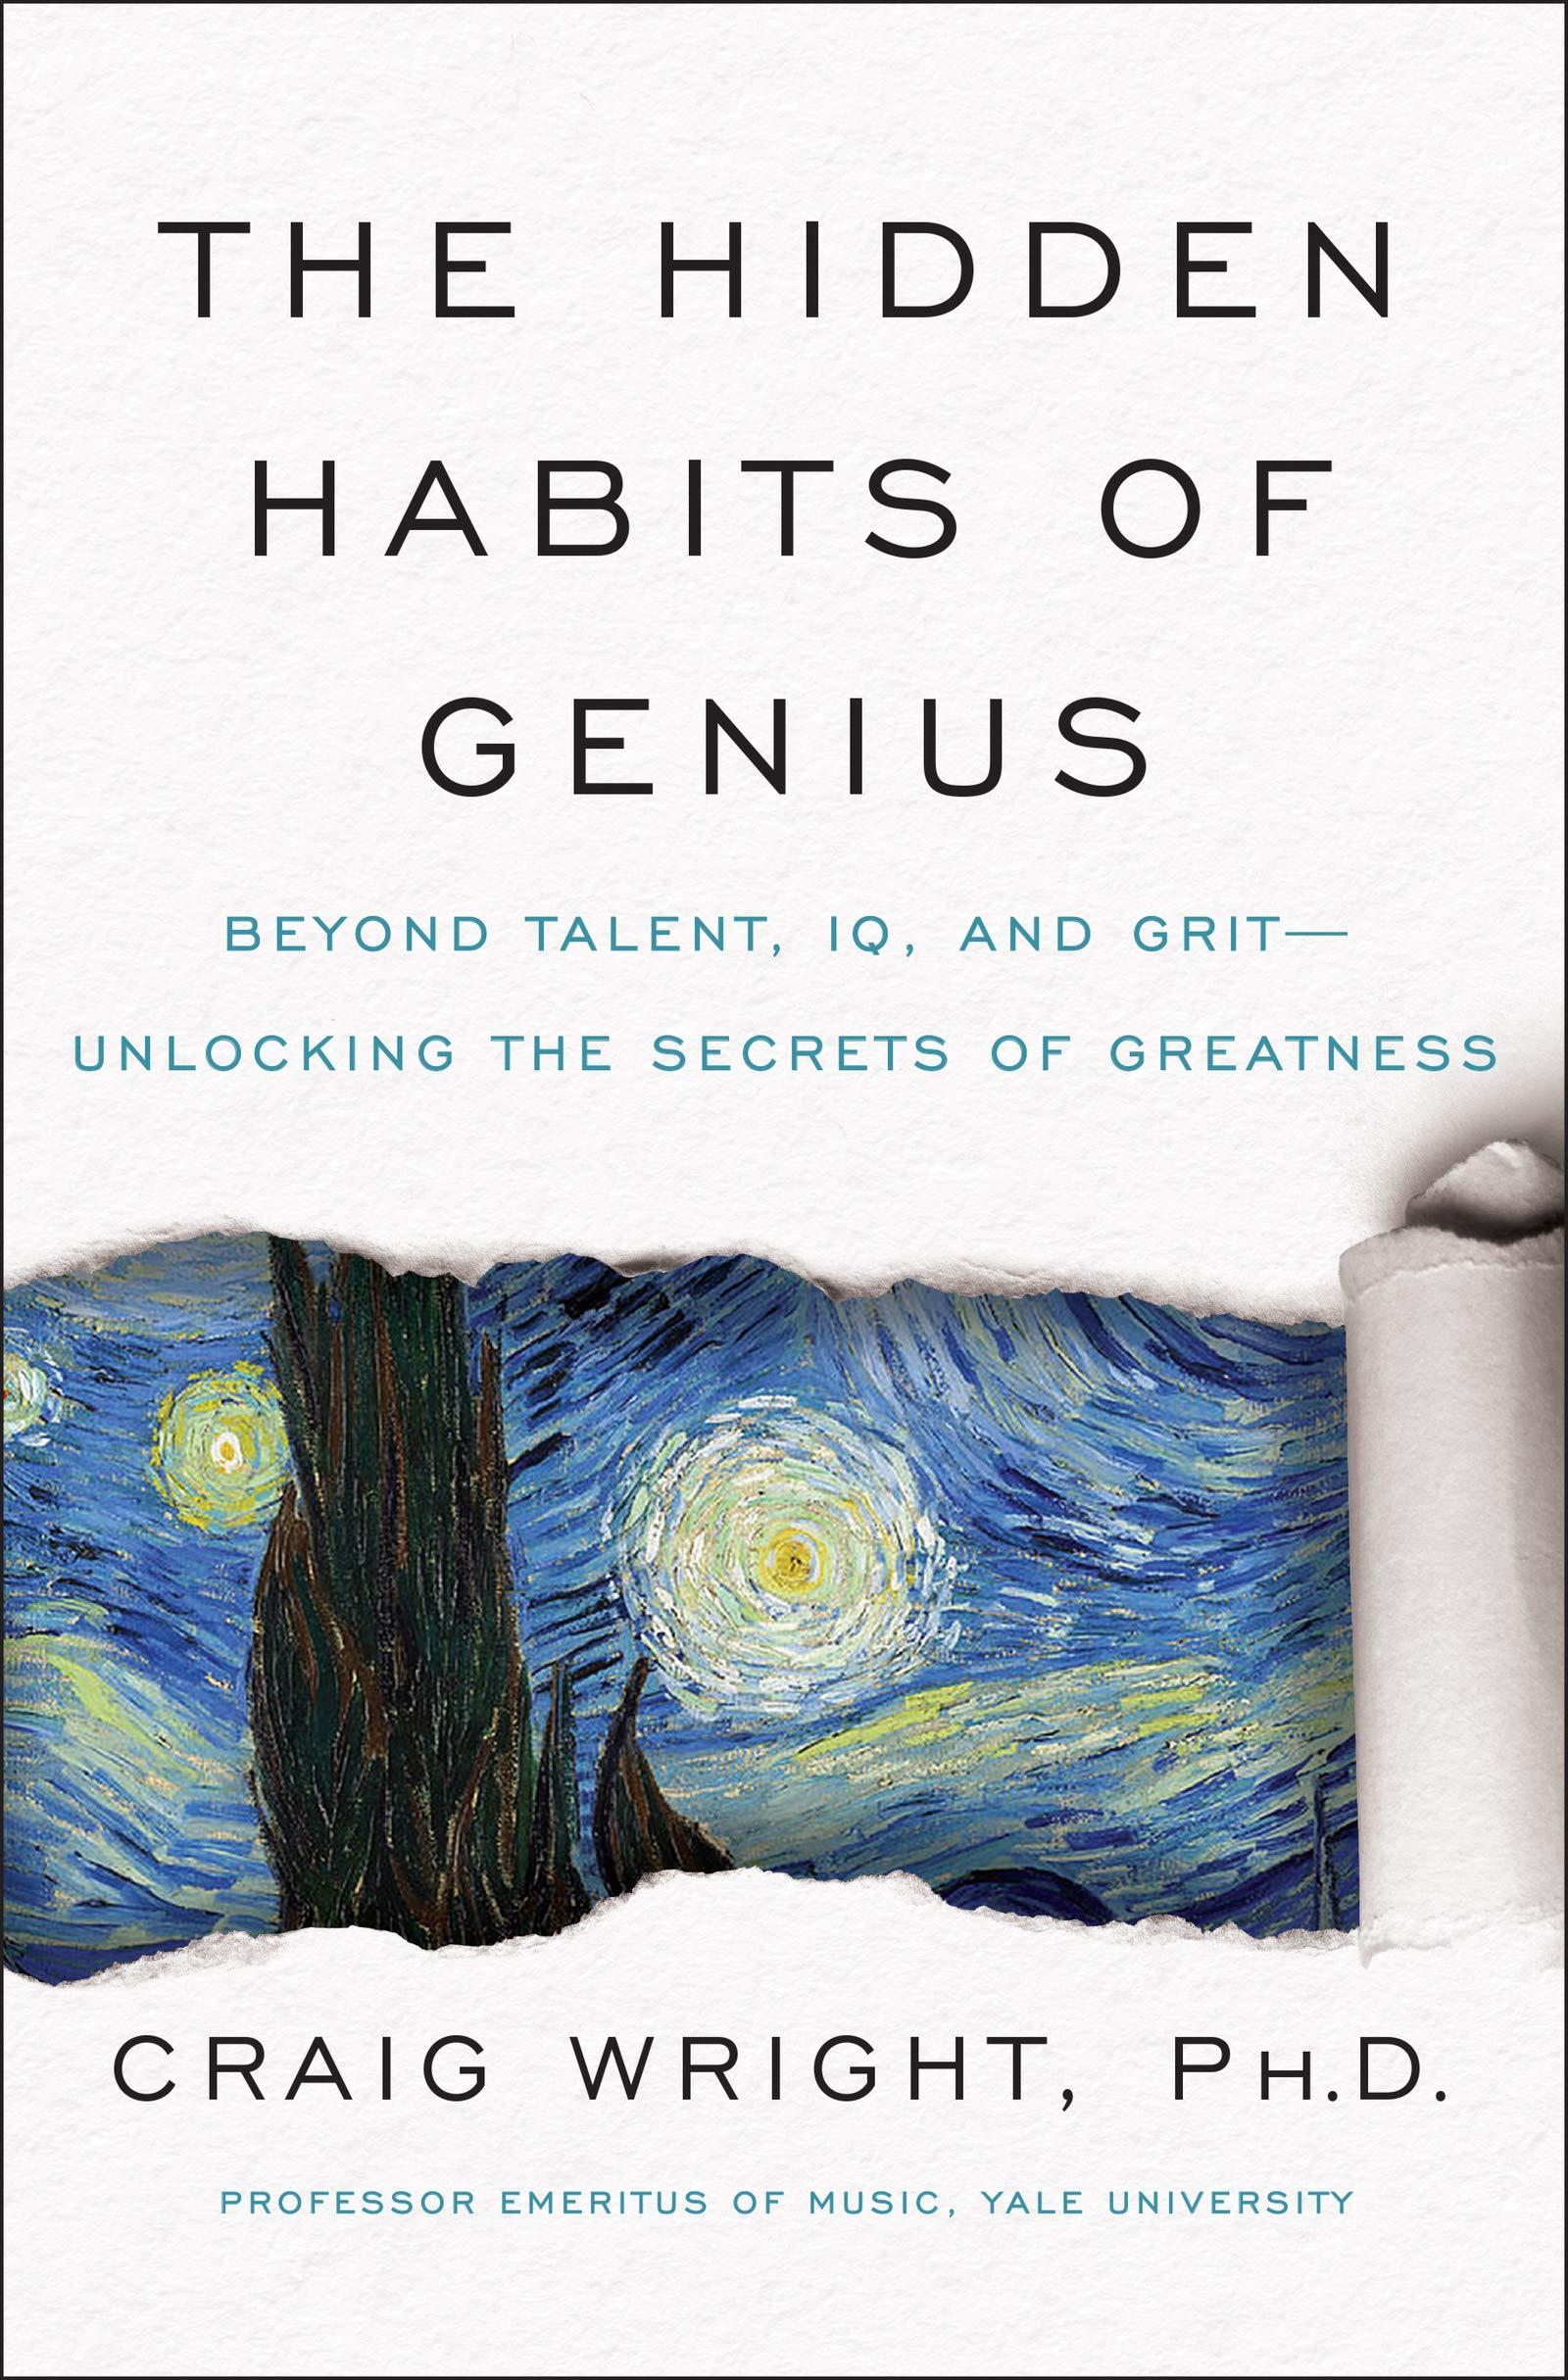 The Hidden Habits of Genius by Craig Wright